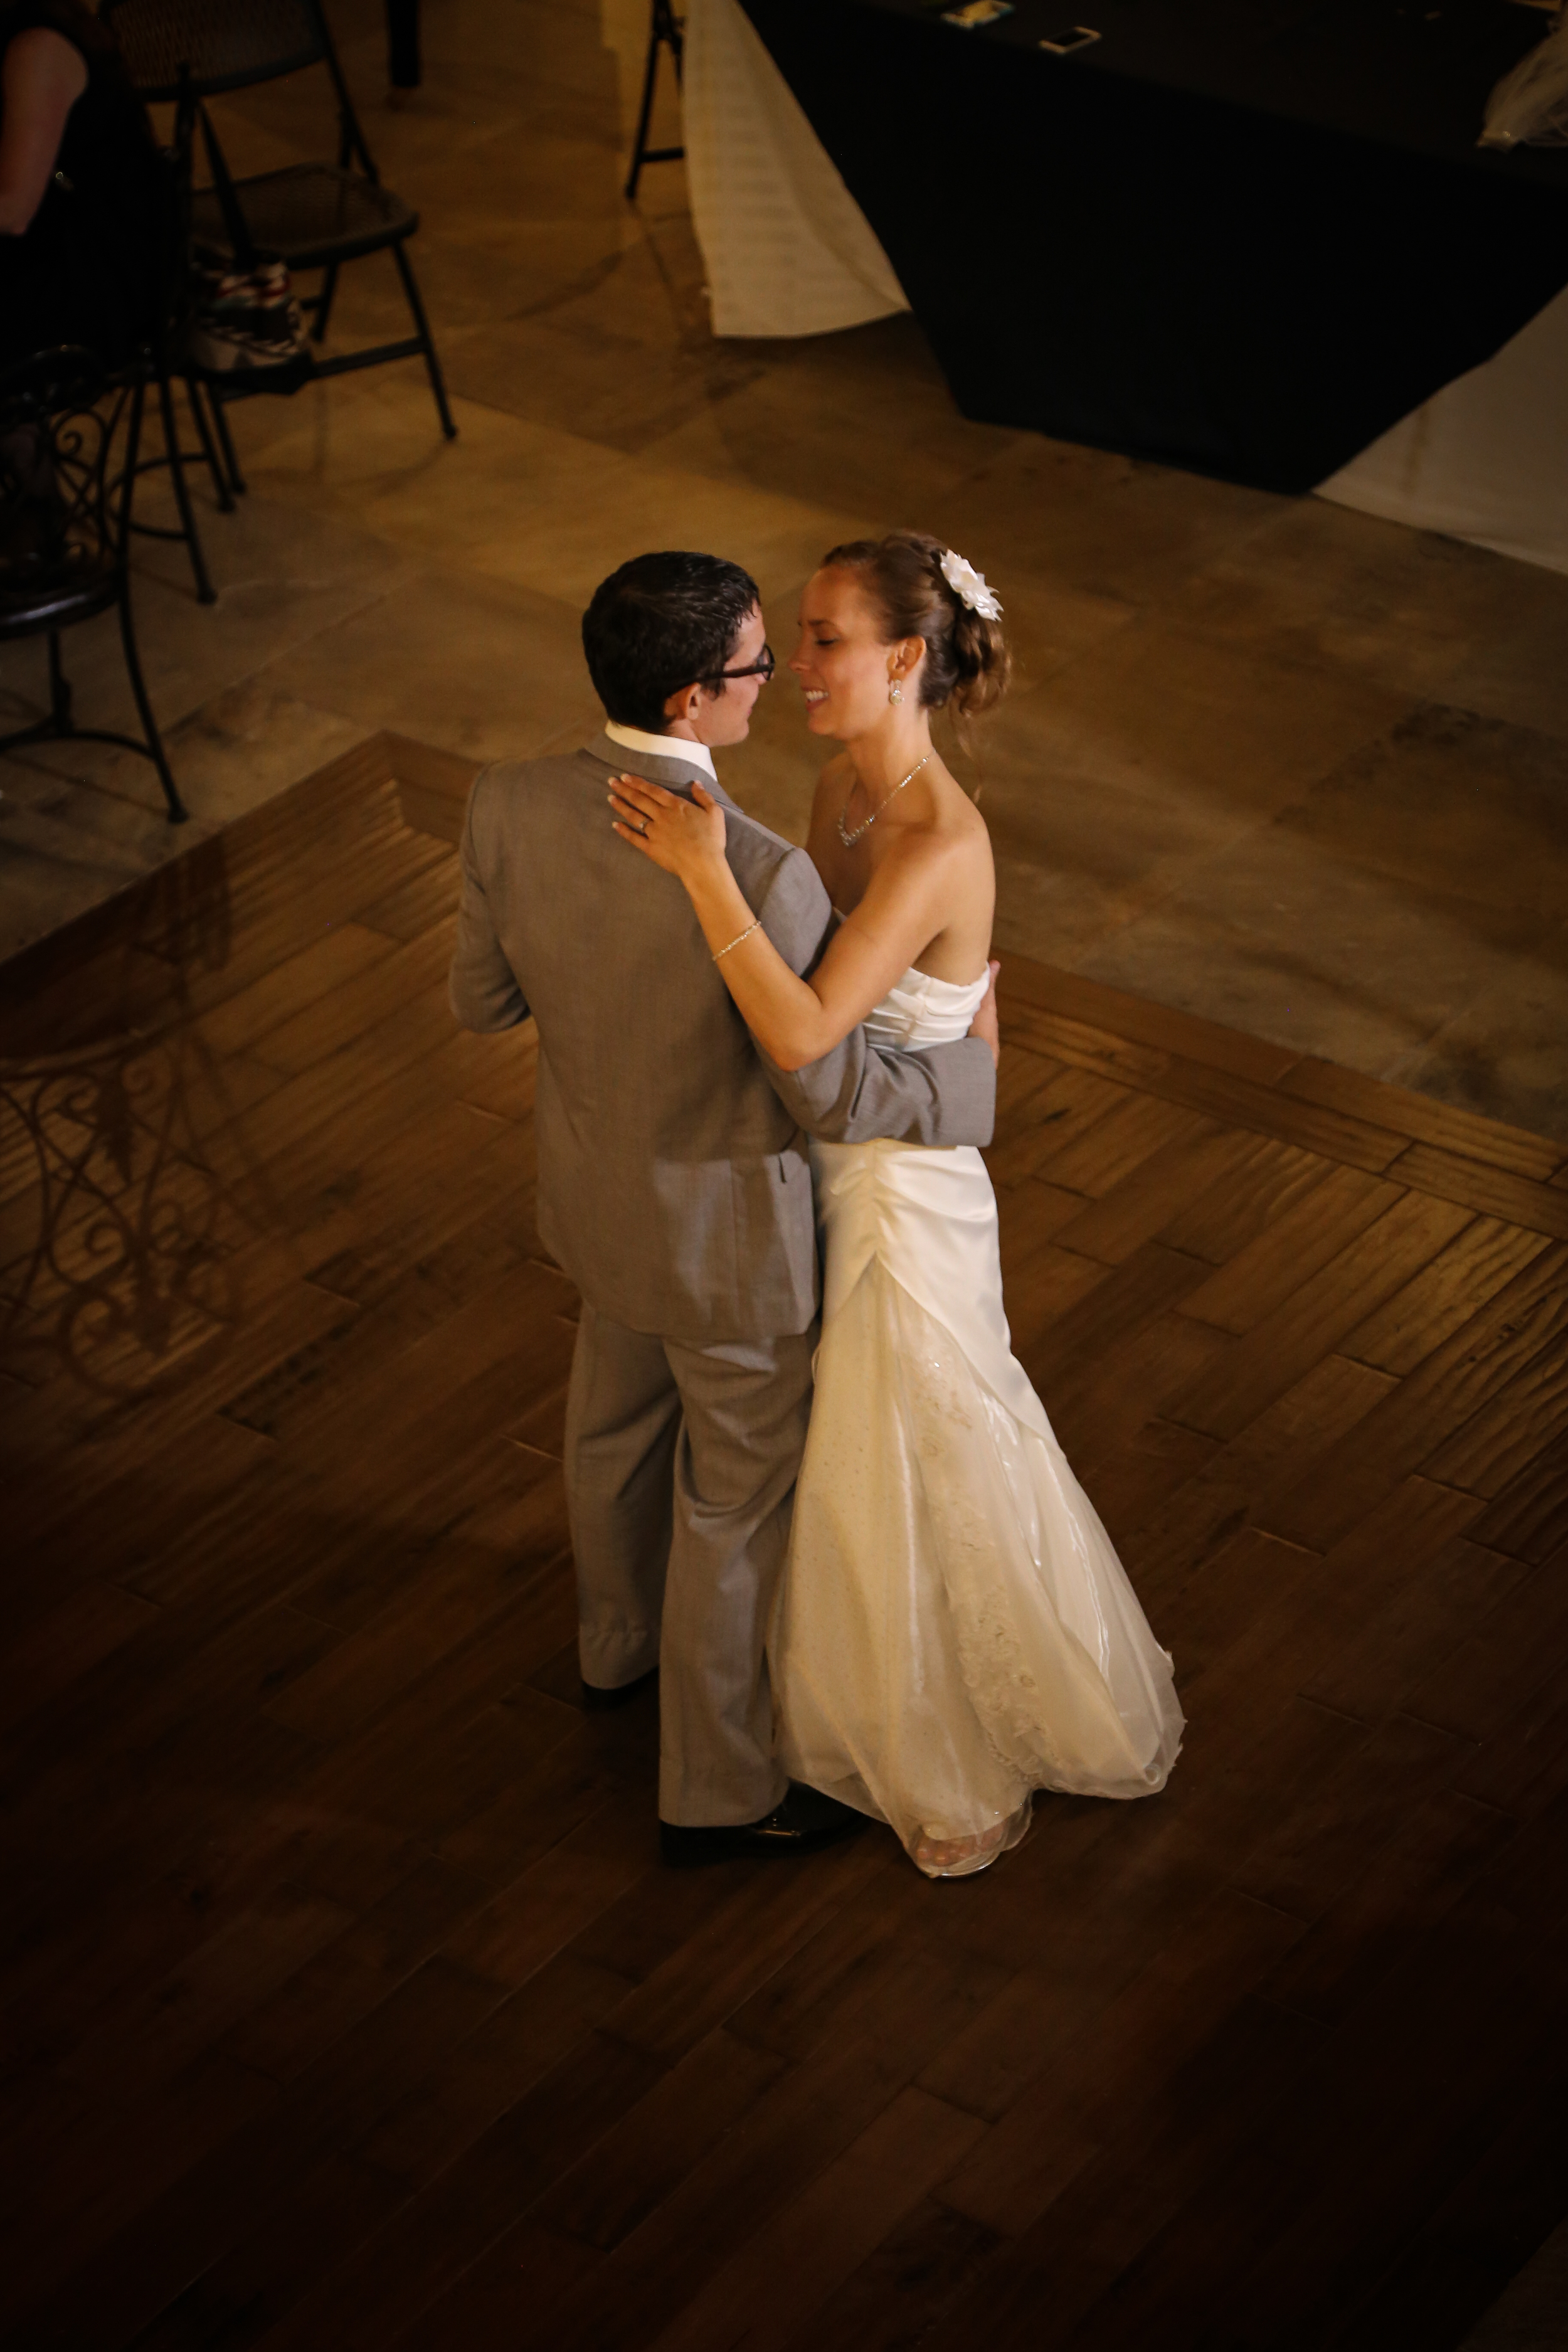 Bountiful wedding photographer, Kelly Loveless